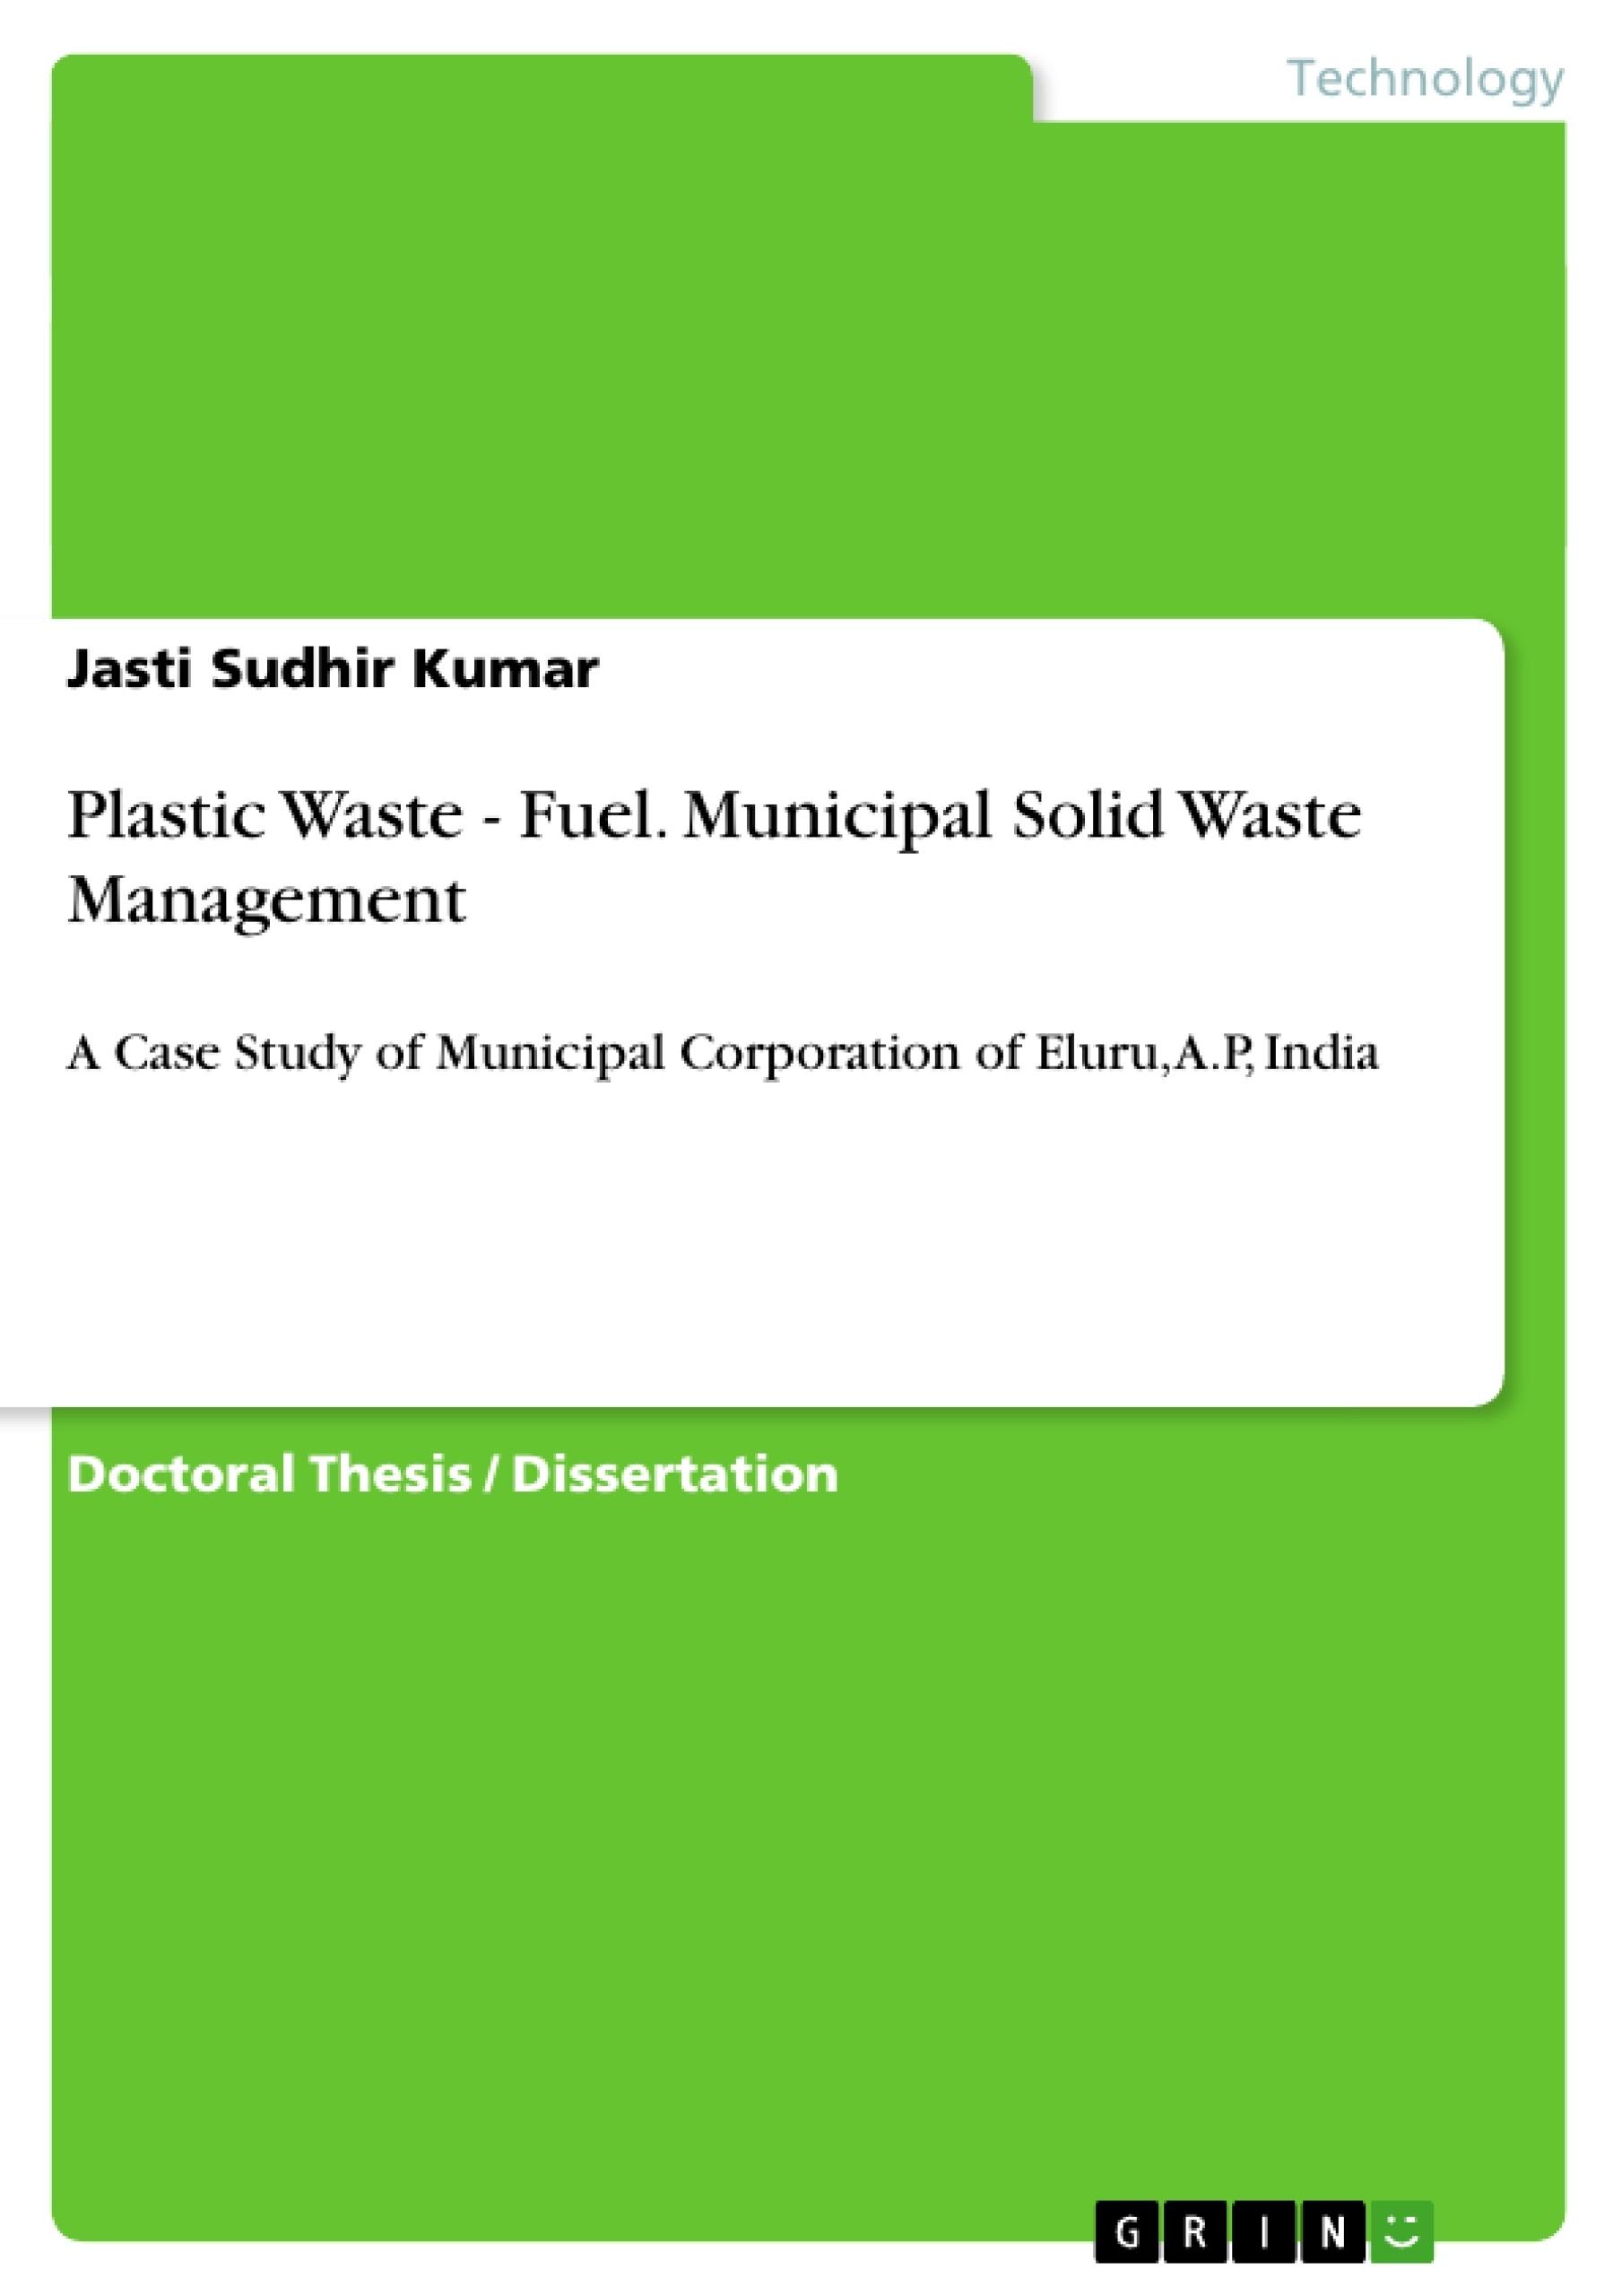 Title: Plastic Waste - Fuel. Municipal Solid Waste Management